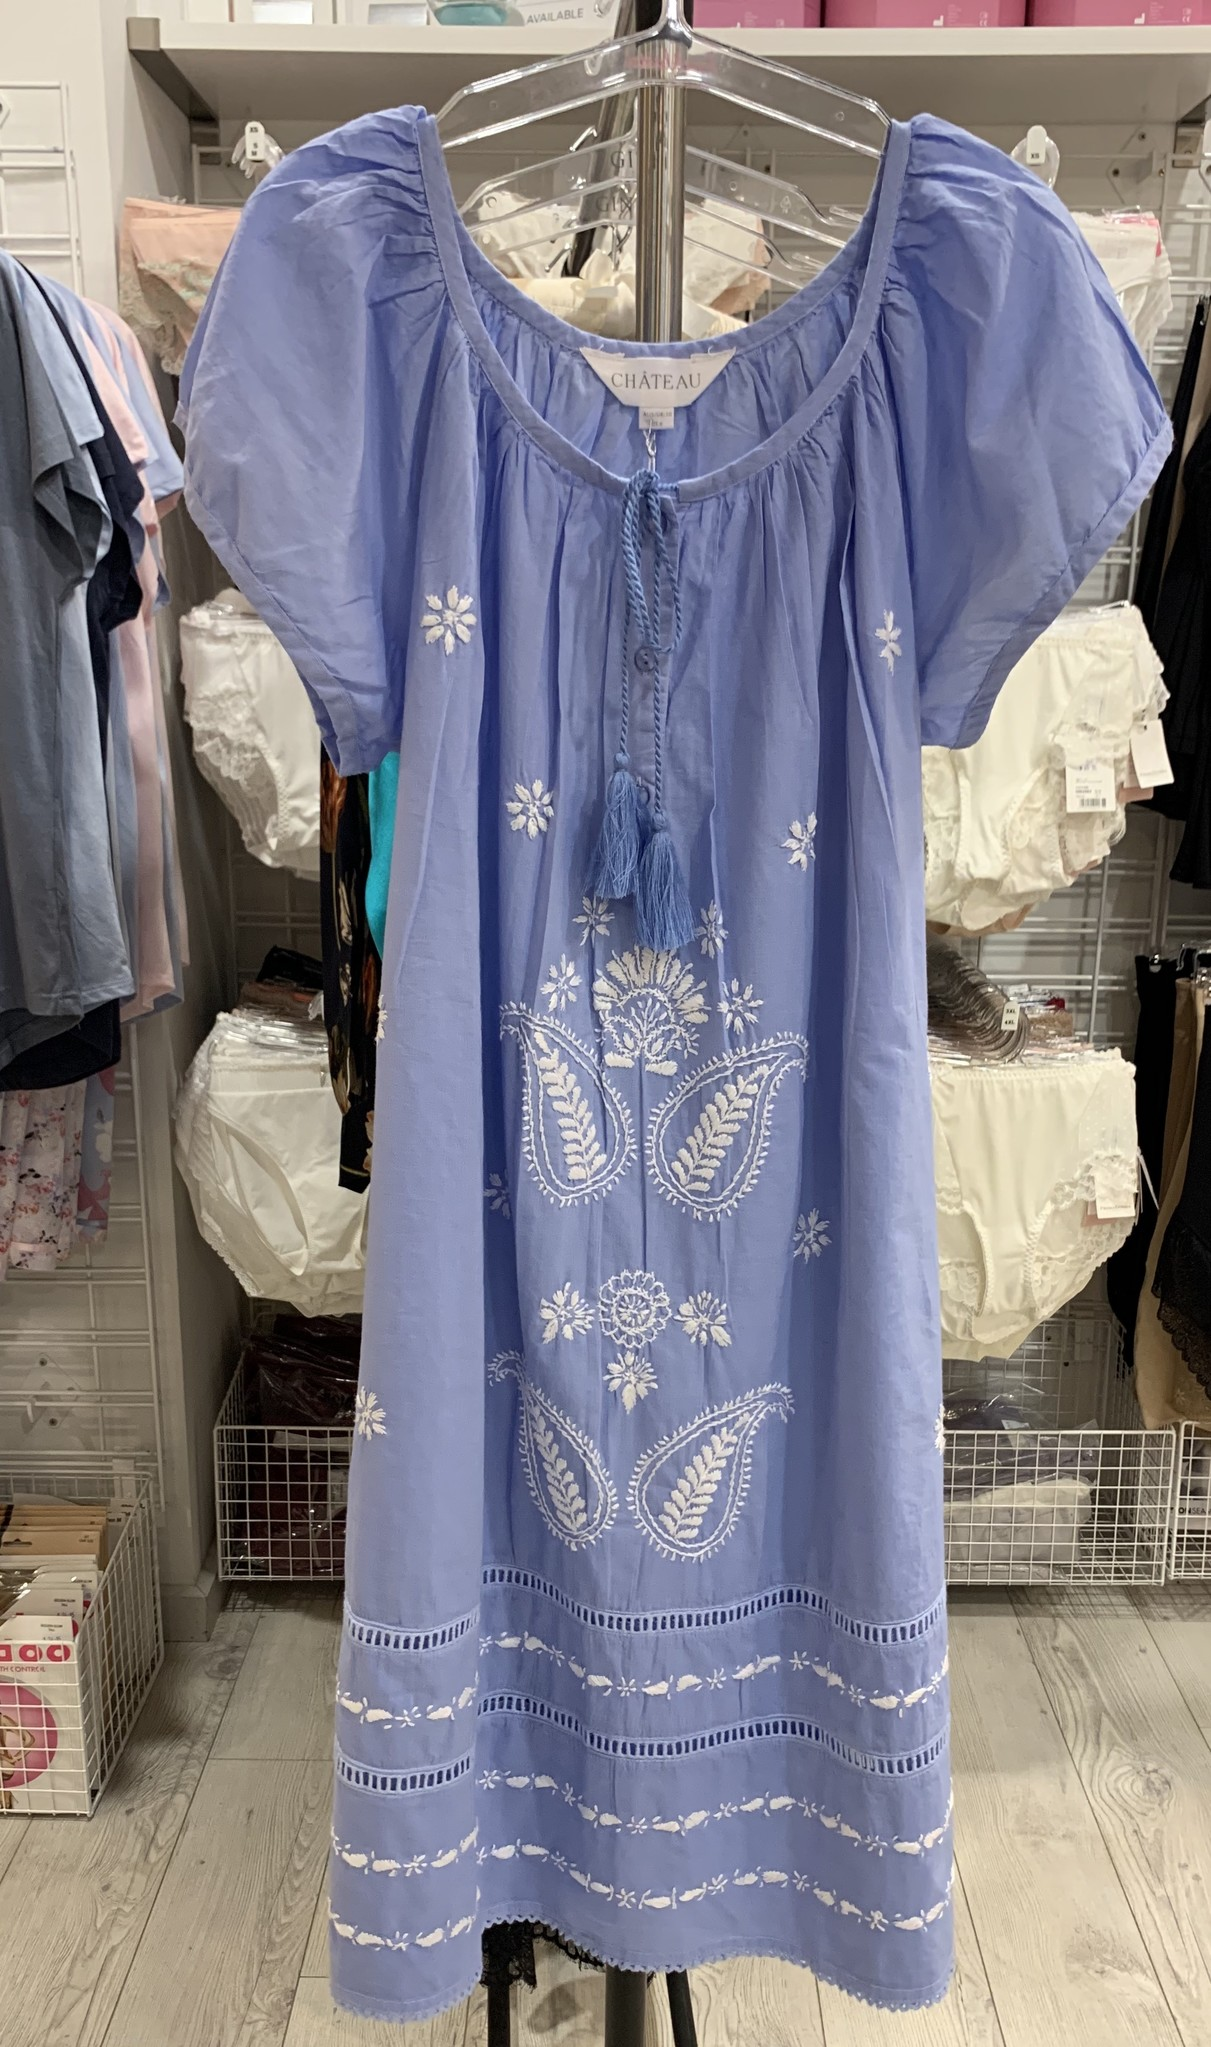 Chateau Chateau Short Nite Blue with White Embroidery CTA403